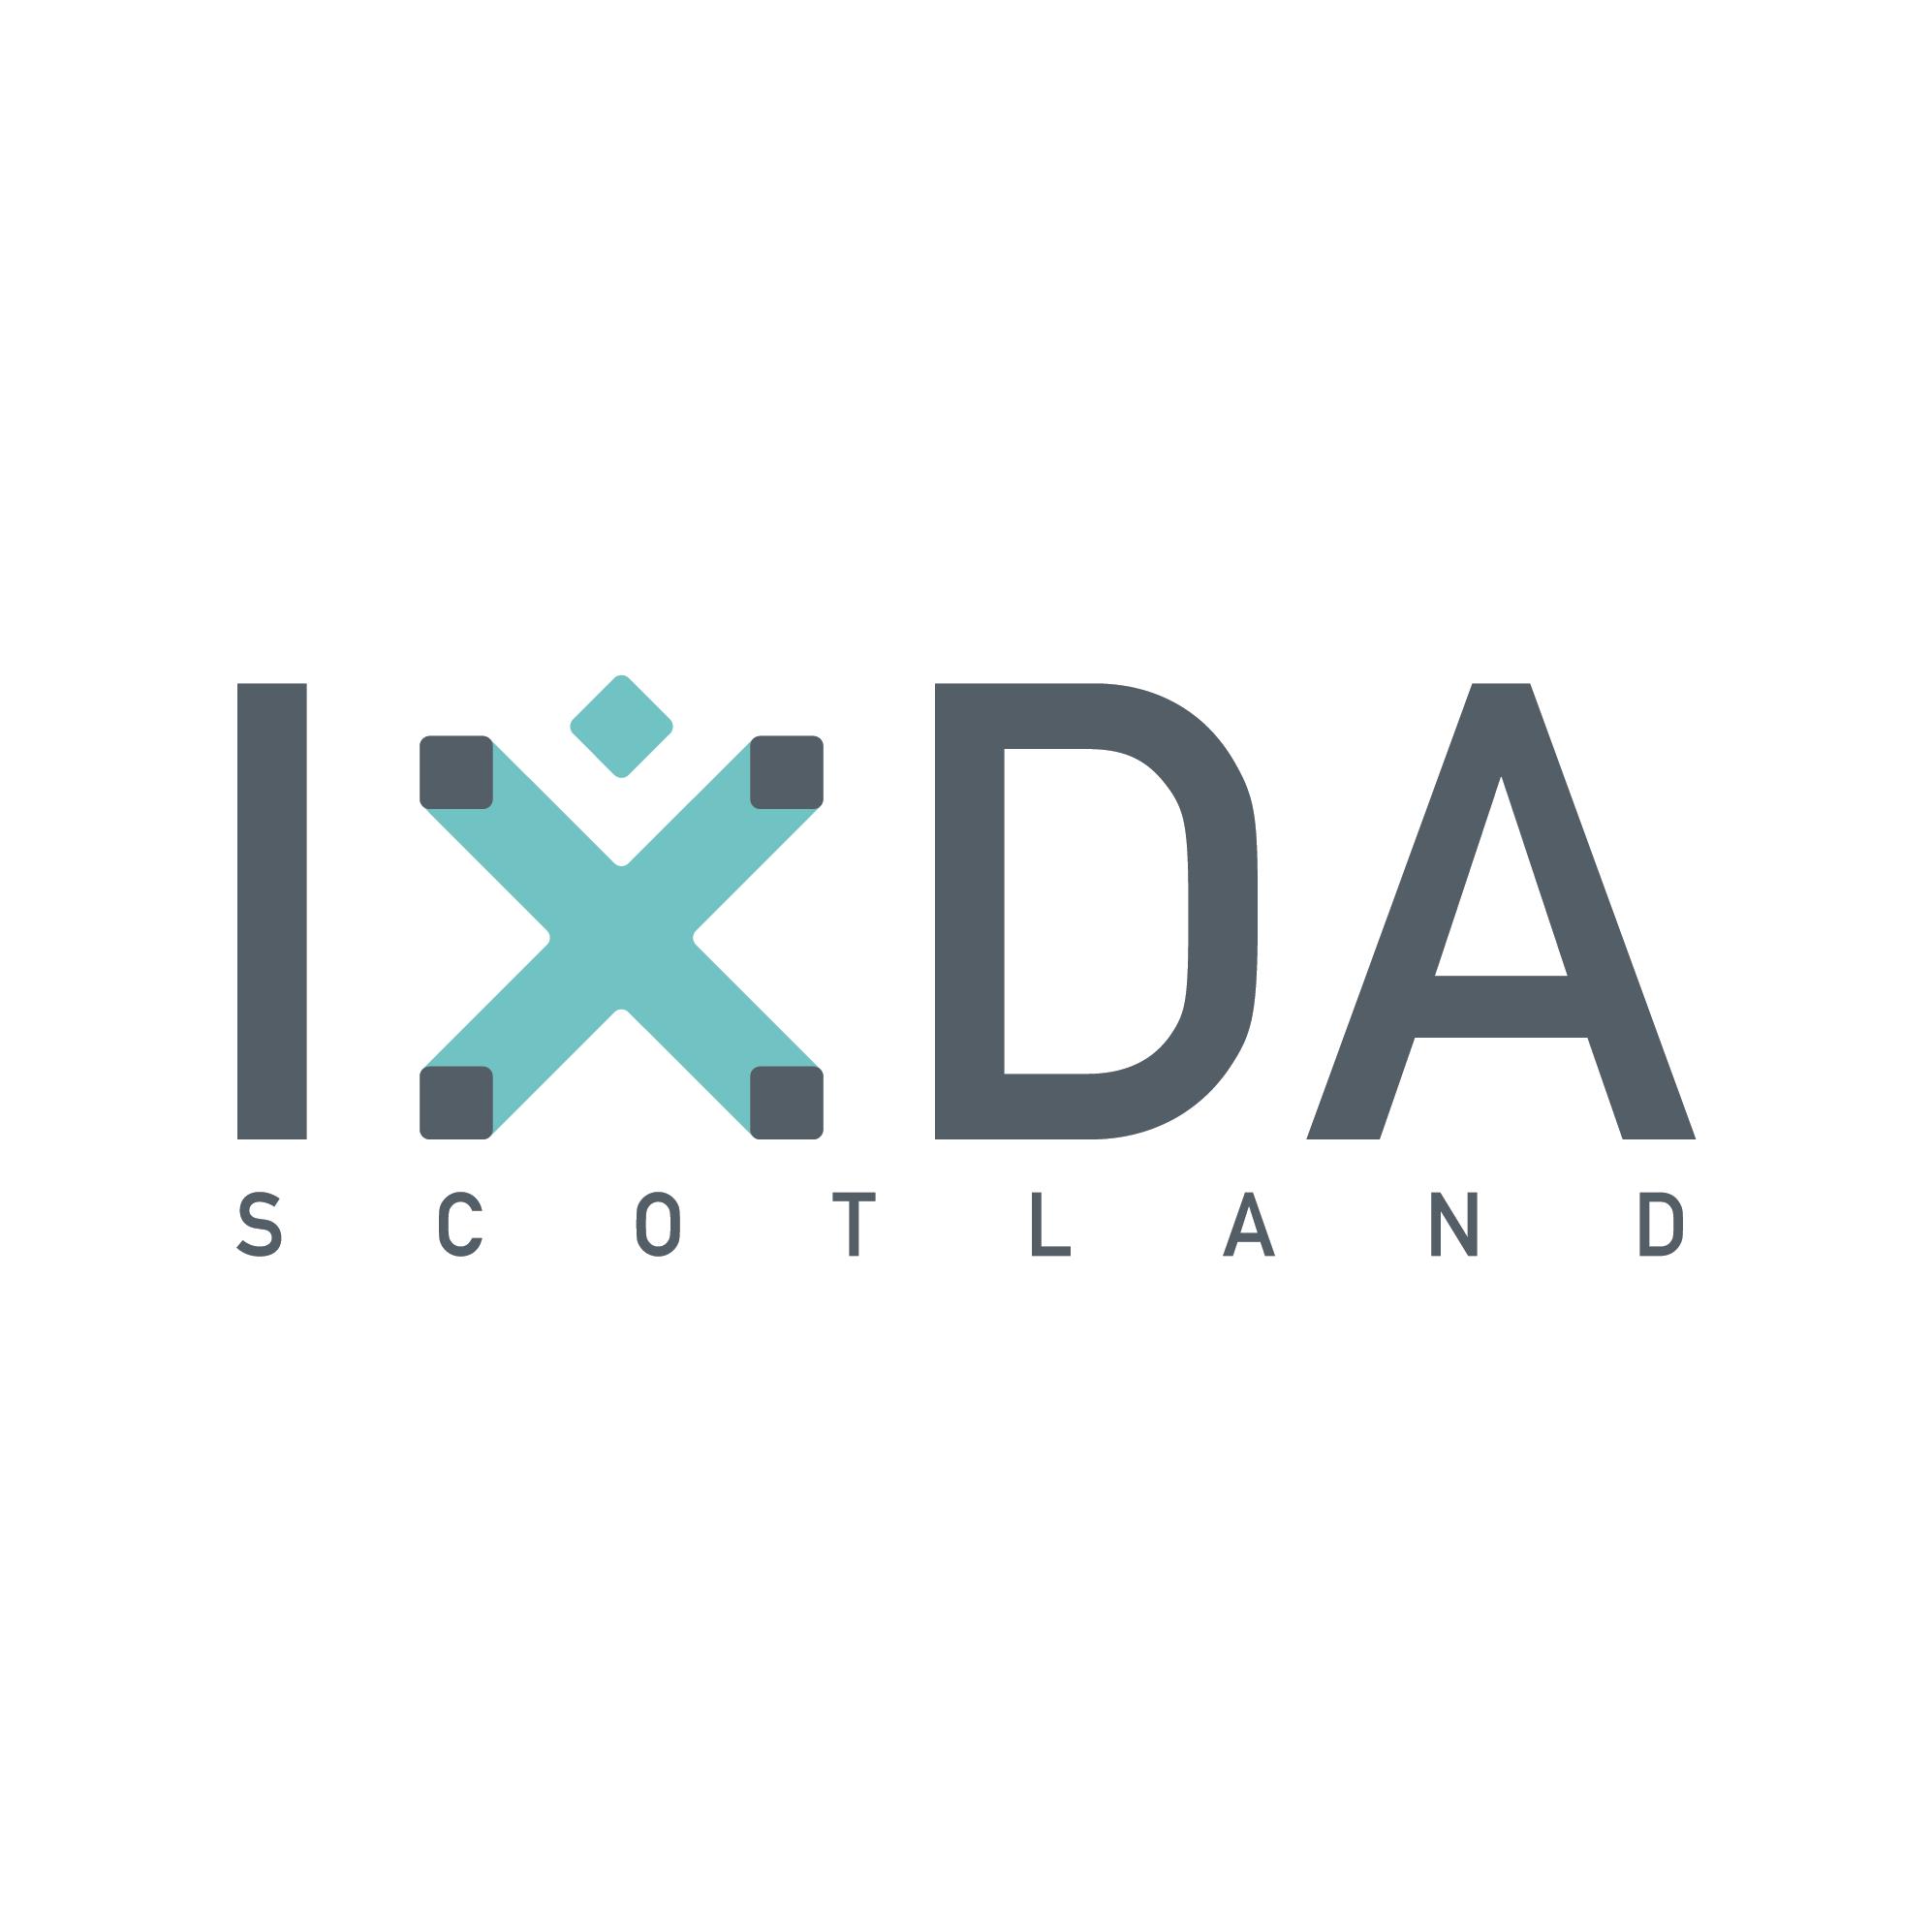 IxDA Scotland